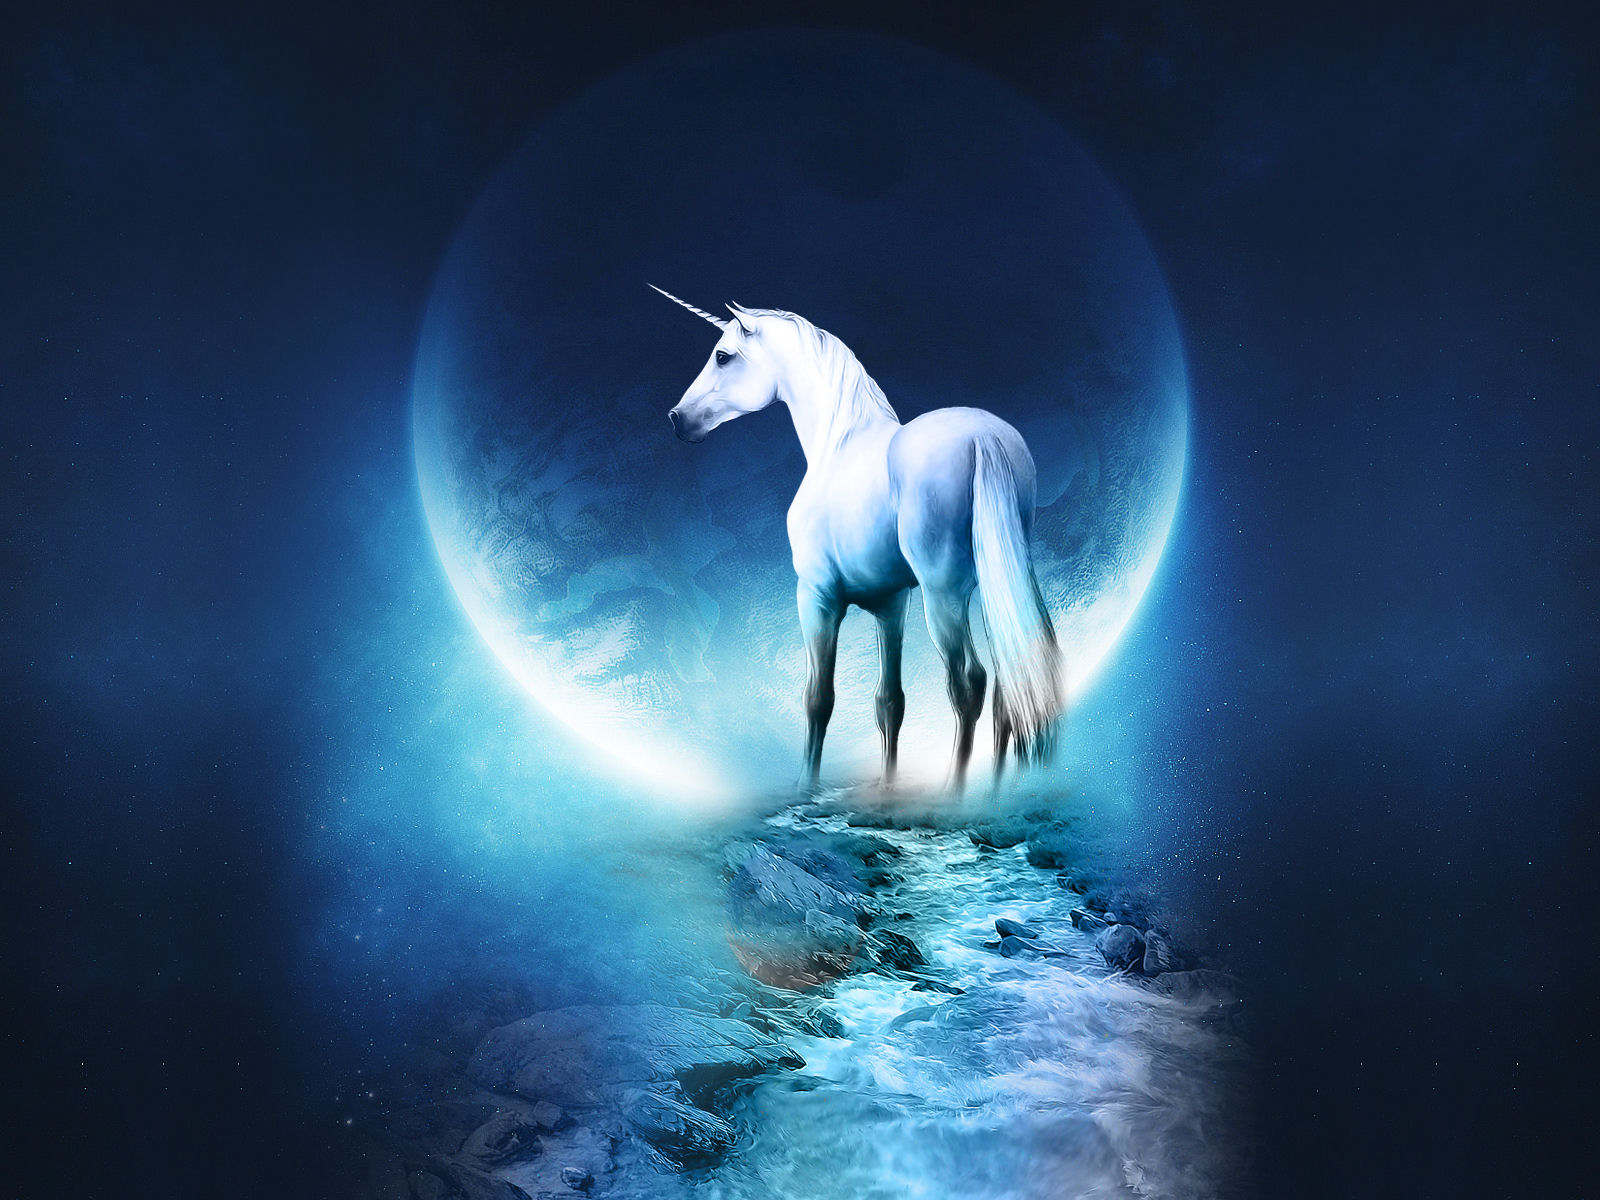 Fantasy%252520space image,fantasy football,fantasy wallpaper,fantasy backgrounds,fantasy art,final fantasy,fantasy love